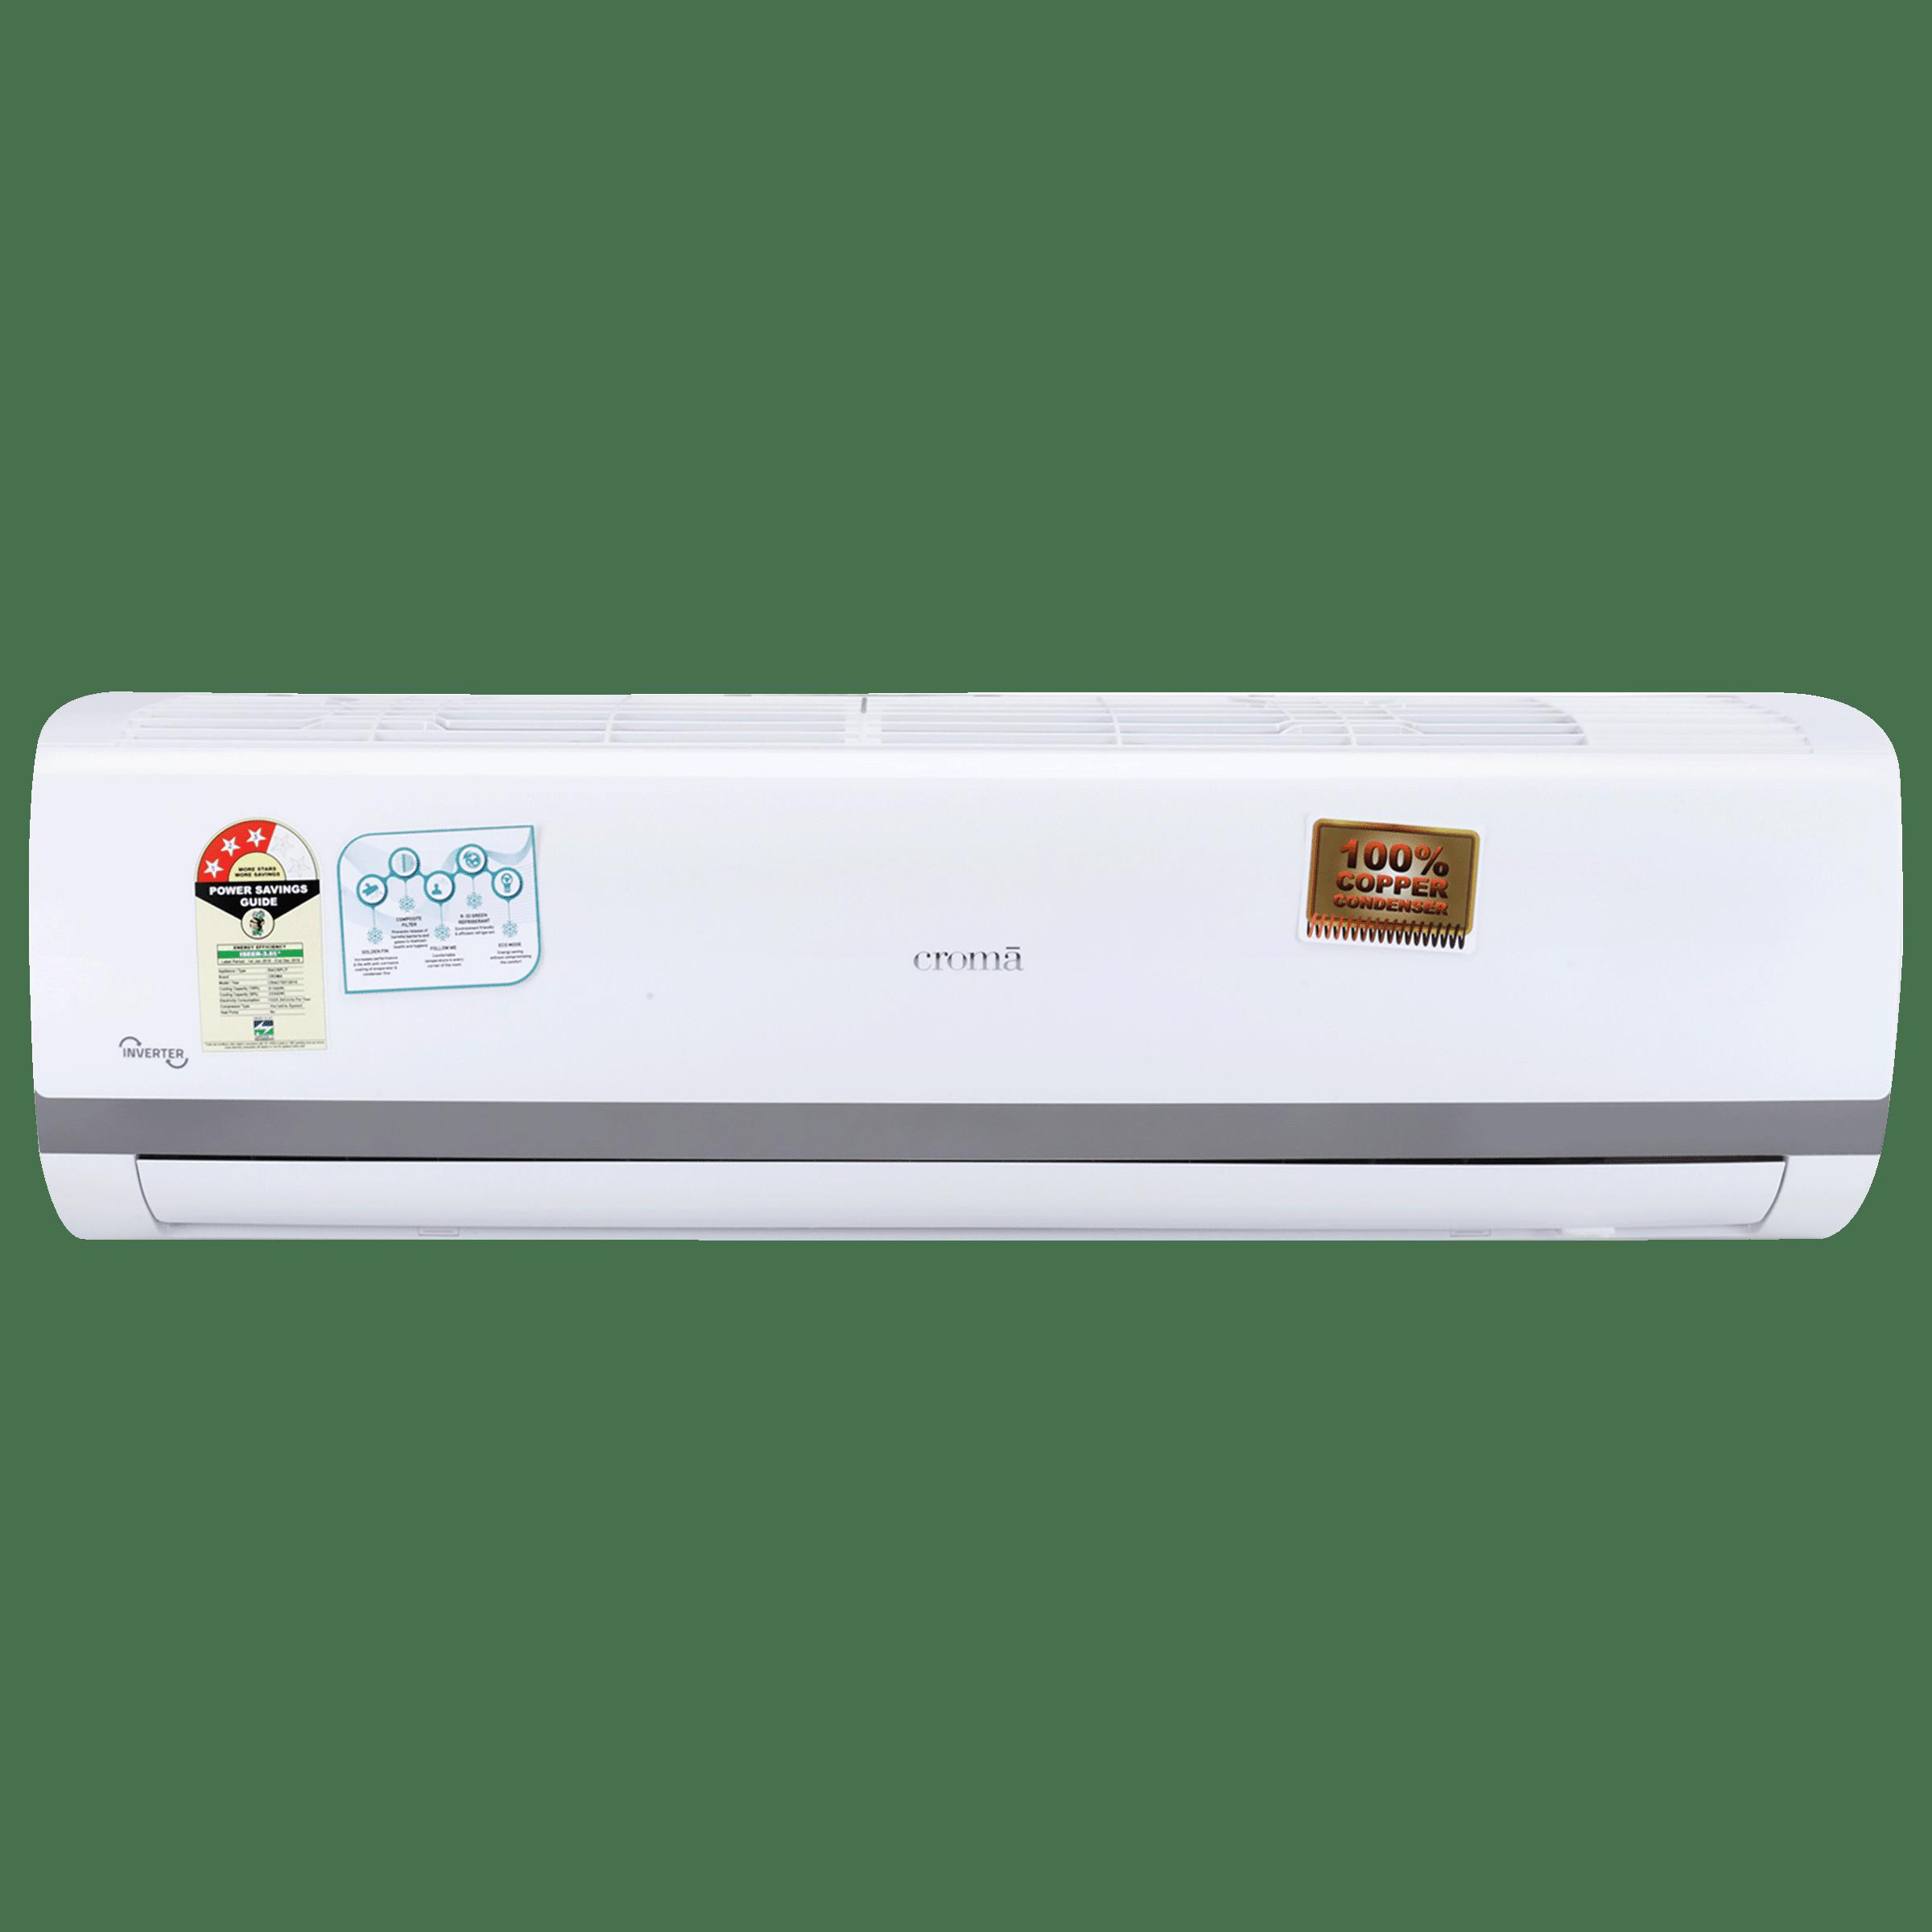 Croma 1.5 Ton 3 Star Inverter Split AC (CRAC7557, Copper Condenser, White)